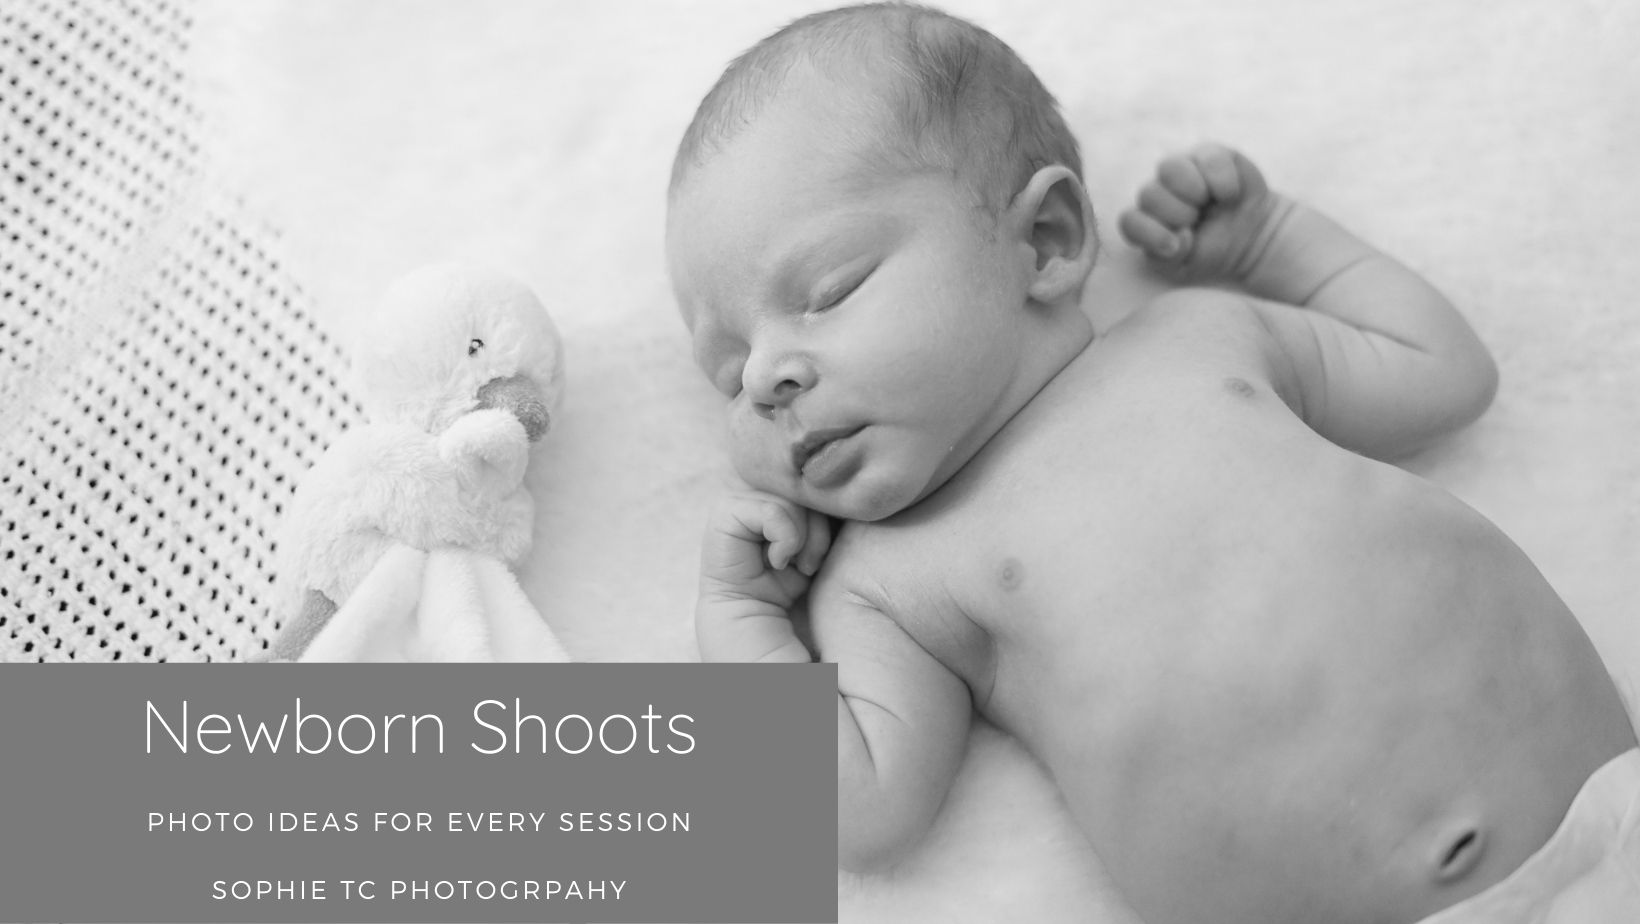 Sleeping baby on a newborn shoot